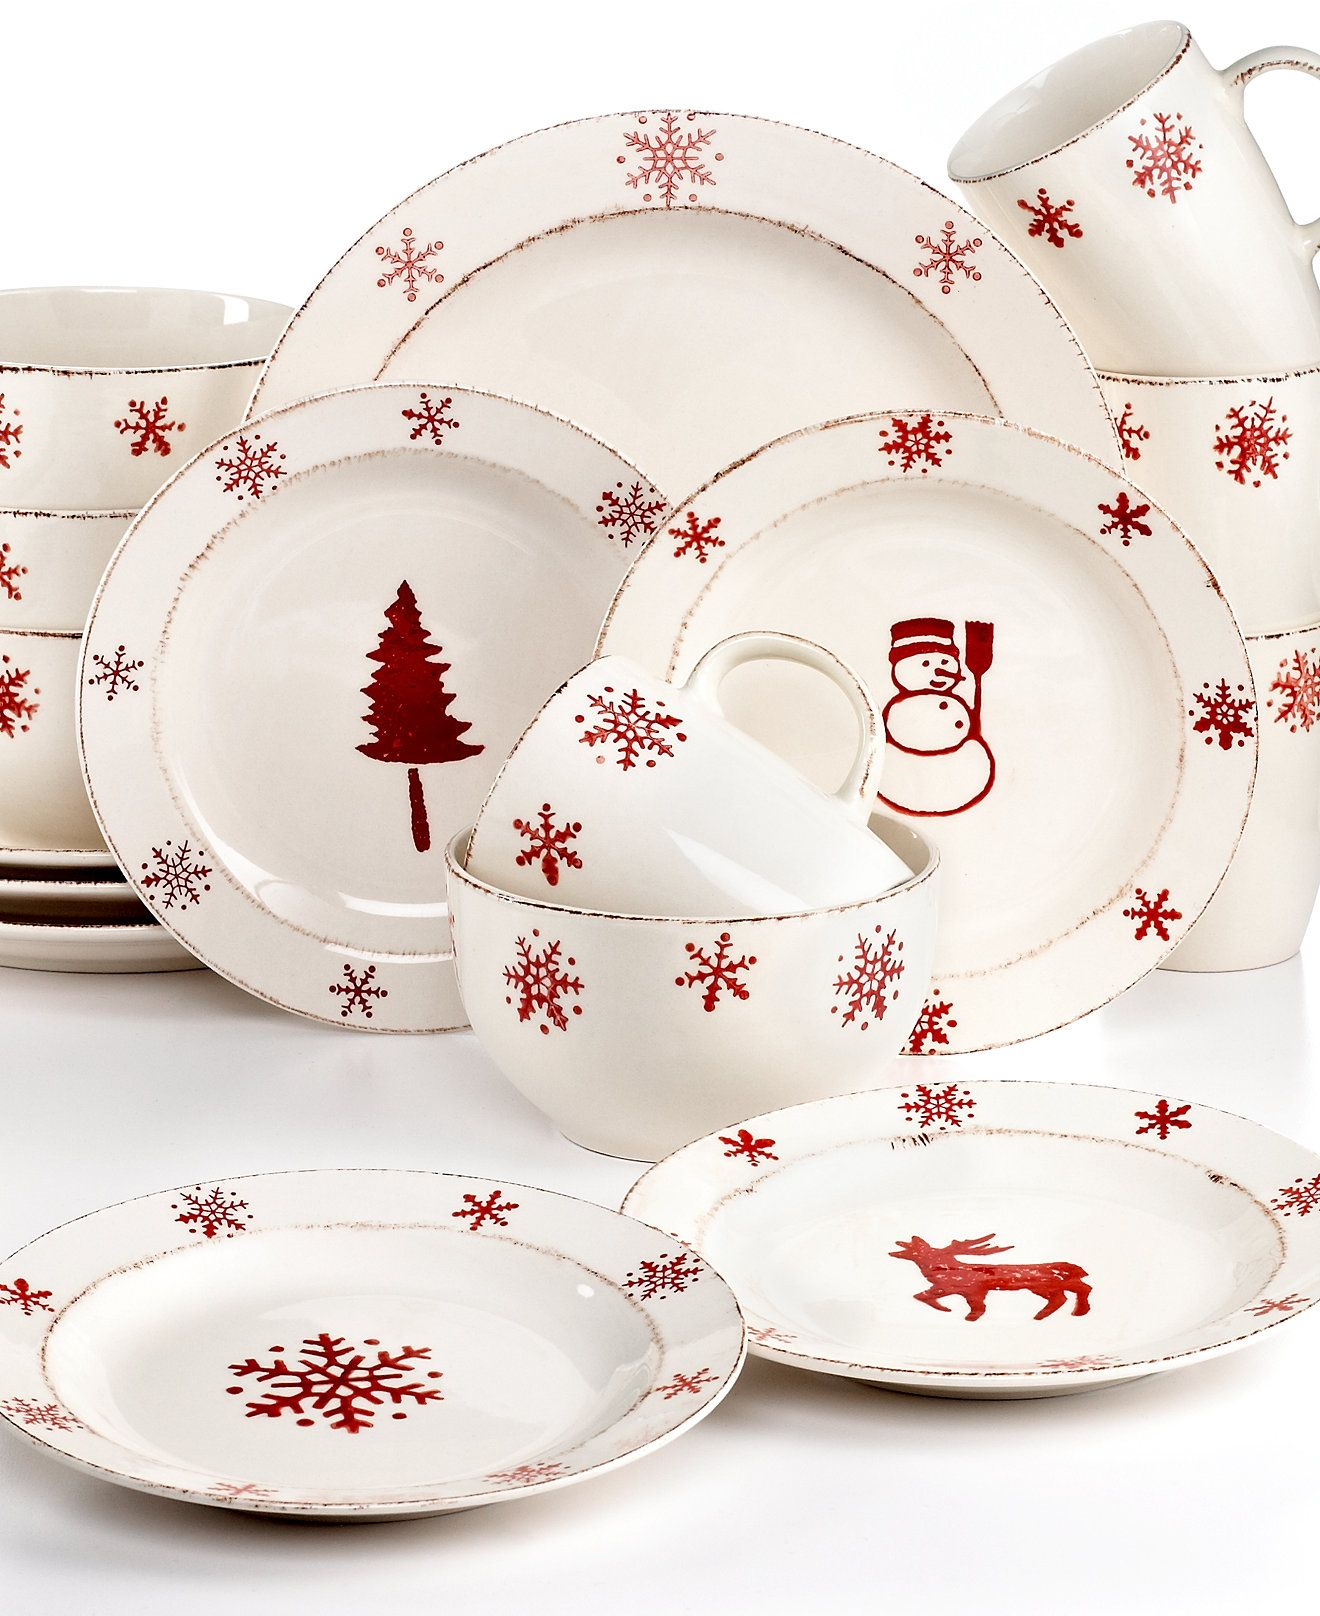 Euroceramica Birchwood Holiday 16 Piece Set Holiday Dining Sale Dining Entertaining Christmas Dinnerware Christmas Tableware Christmas Dinnerware Sets